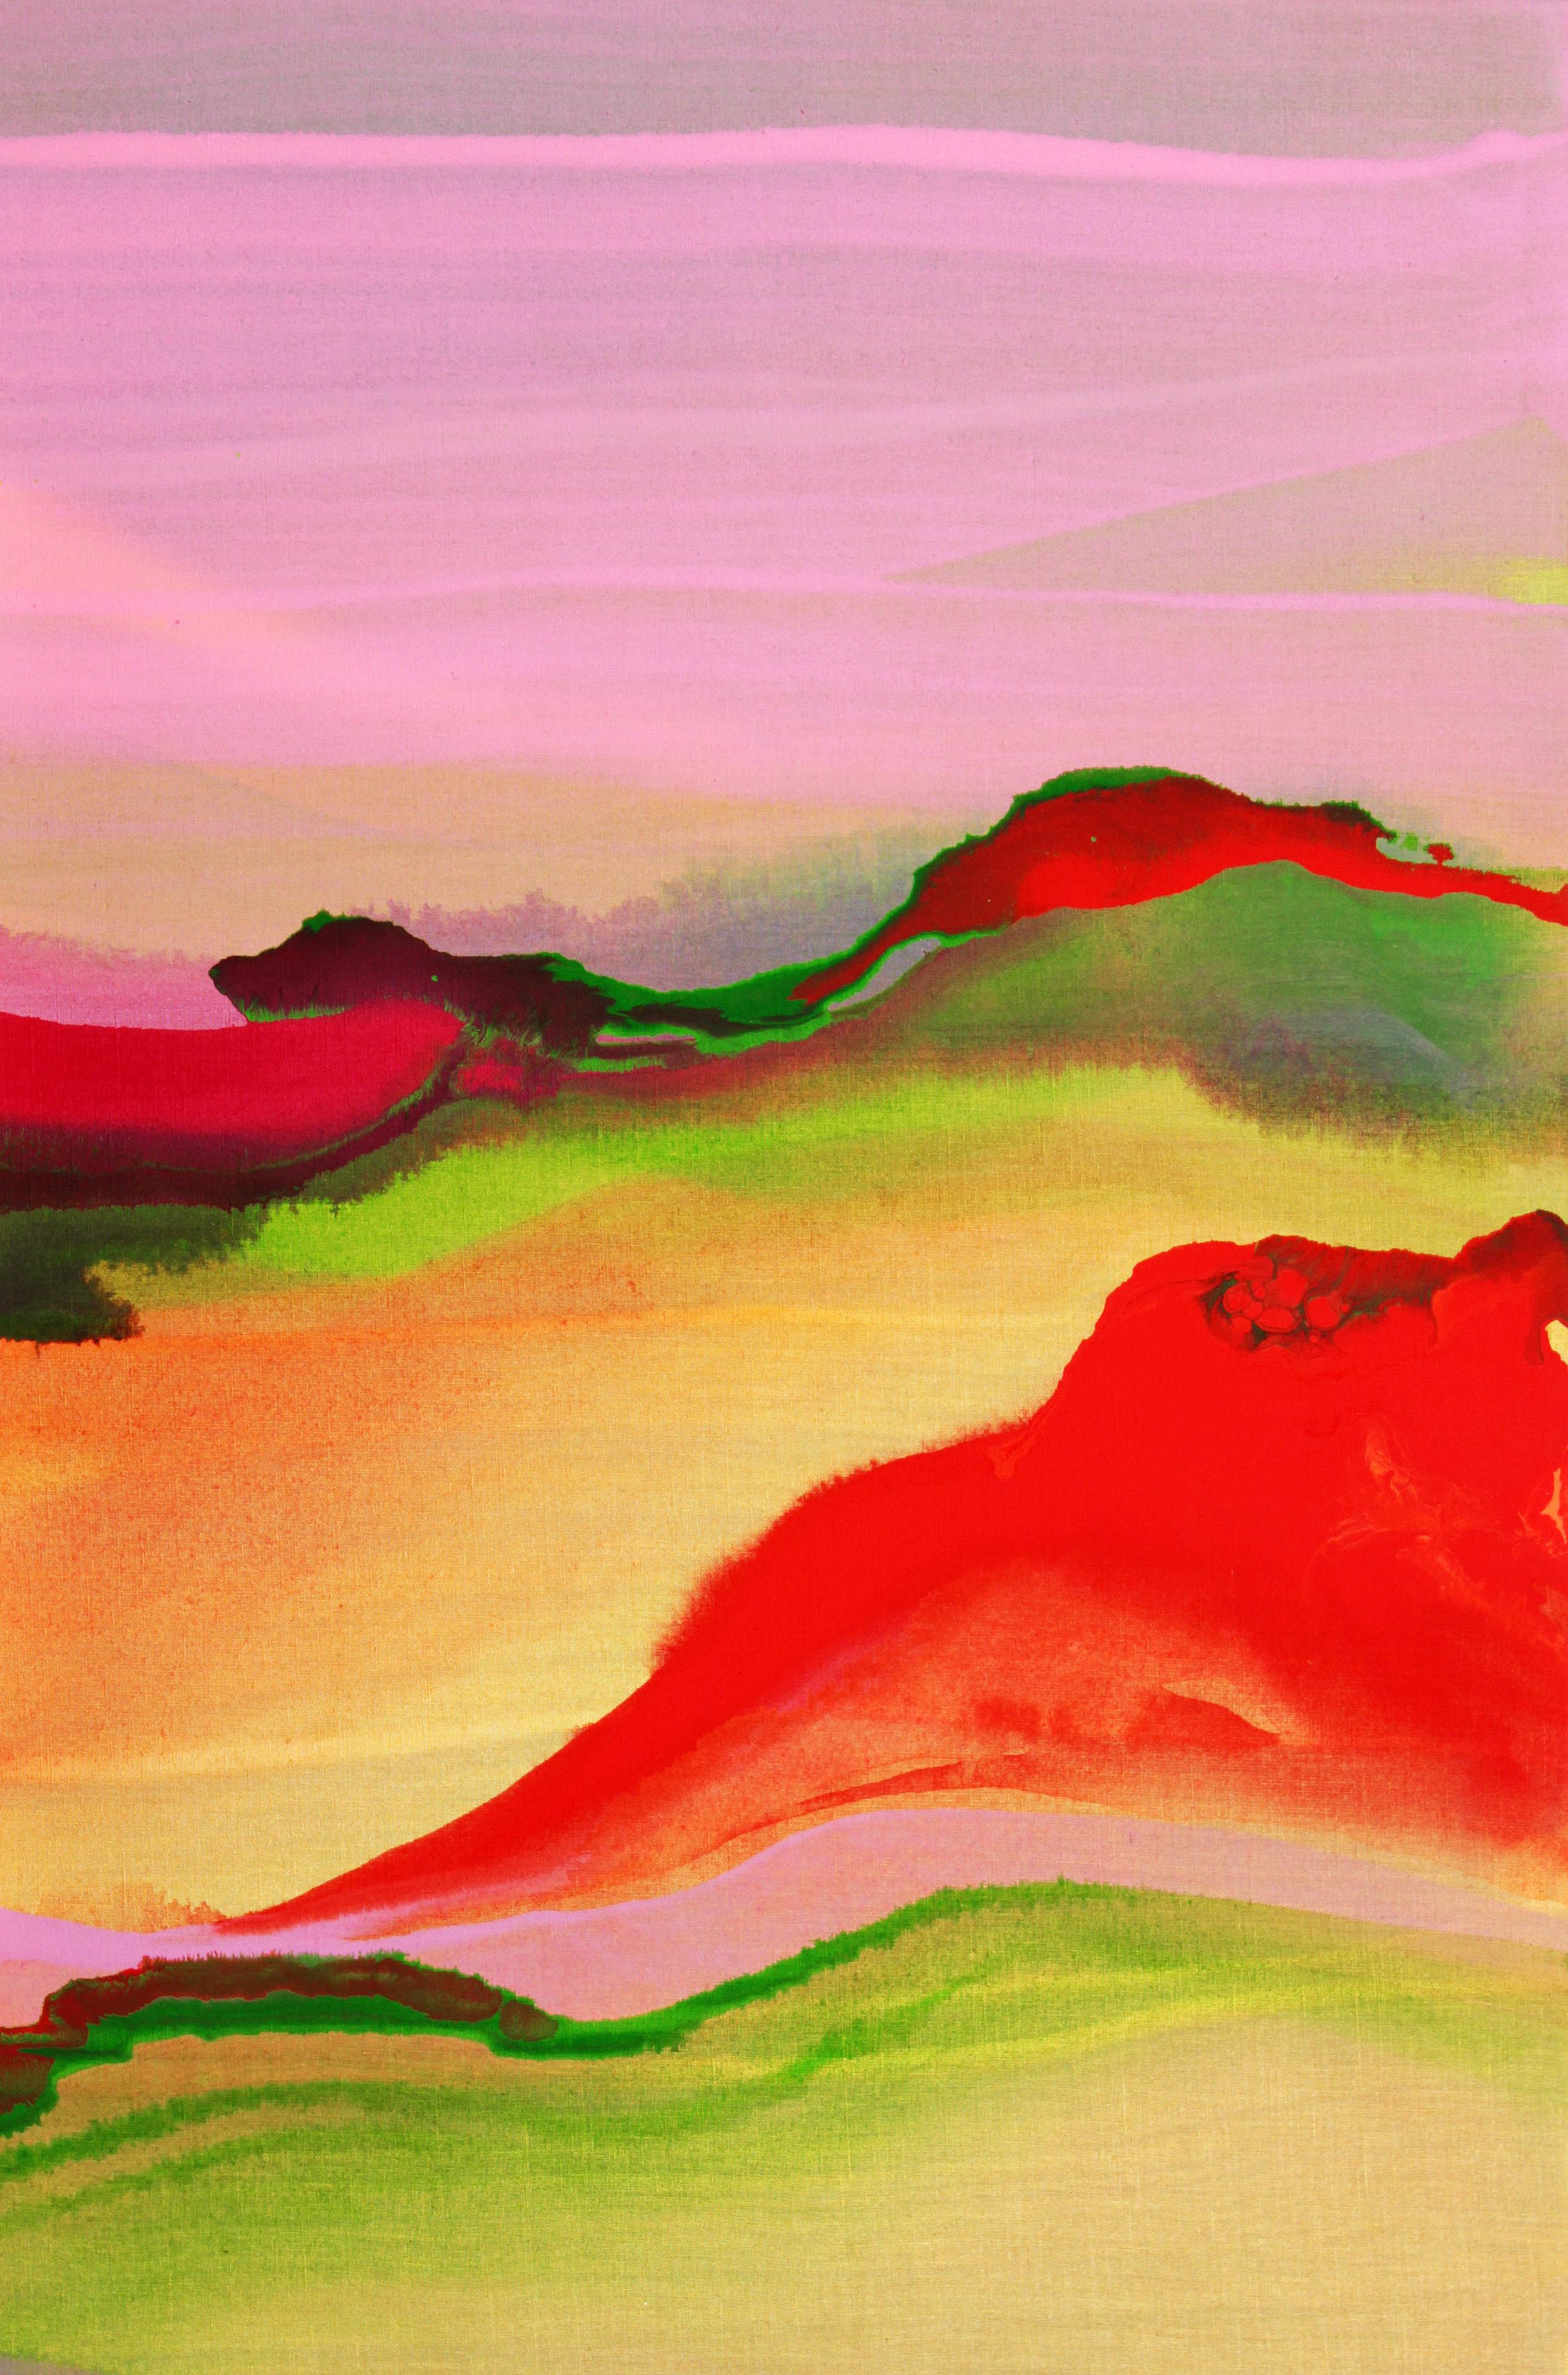 Nico Munuera: Fusima Color XXI, 2016. Acrylic on Linen, 35 1/2 x 23 1/2 inches